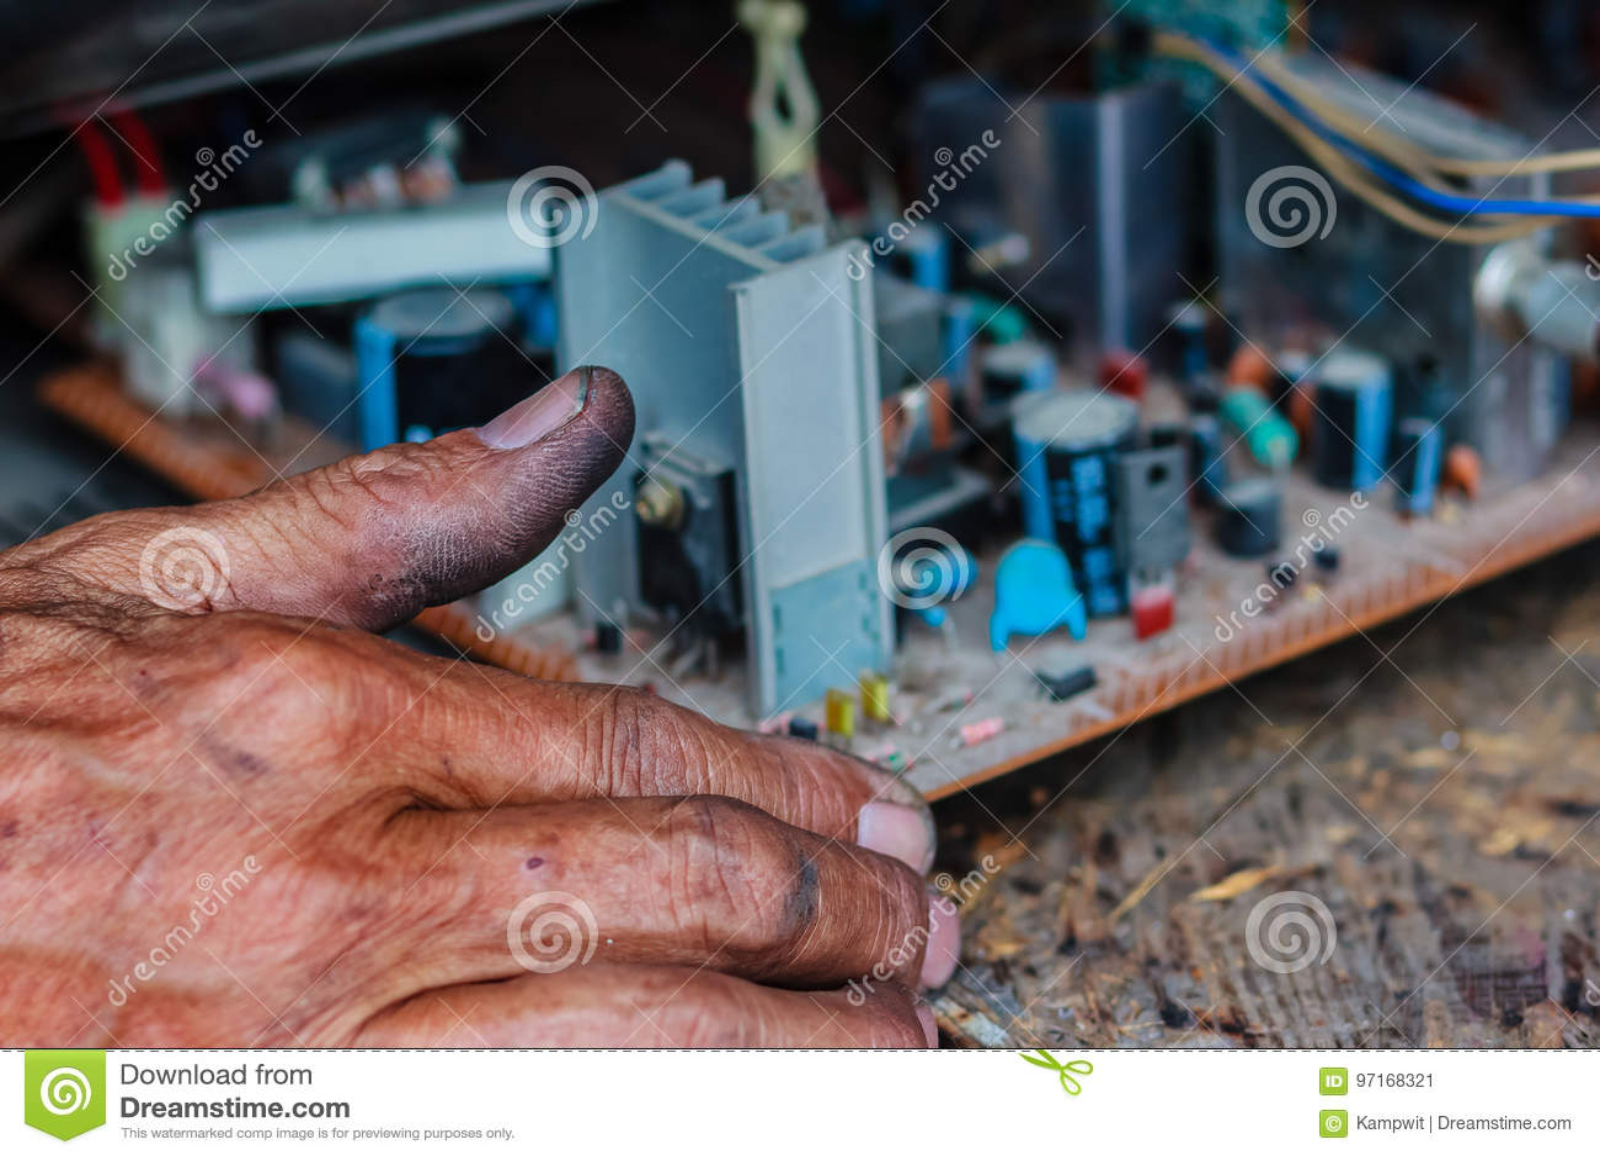 Electrician Repairing A TV In Old Television Repair Shop Stock Image - Image of measurement